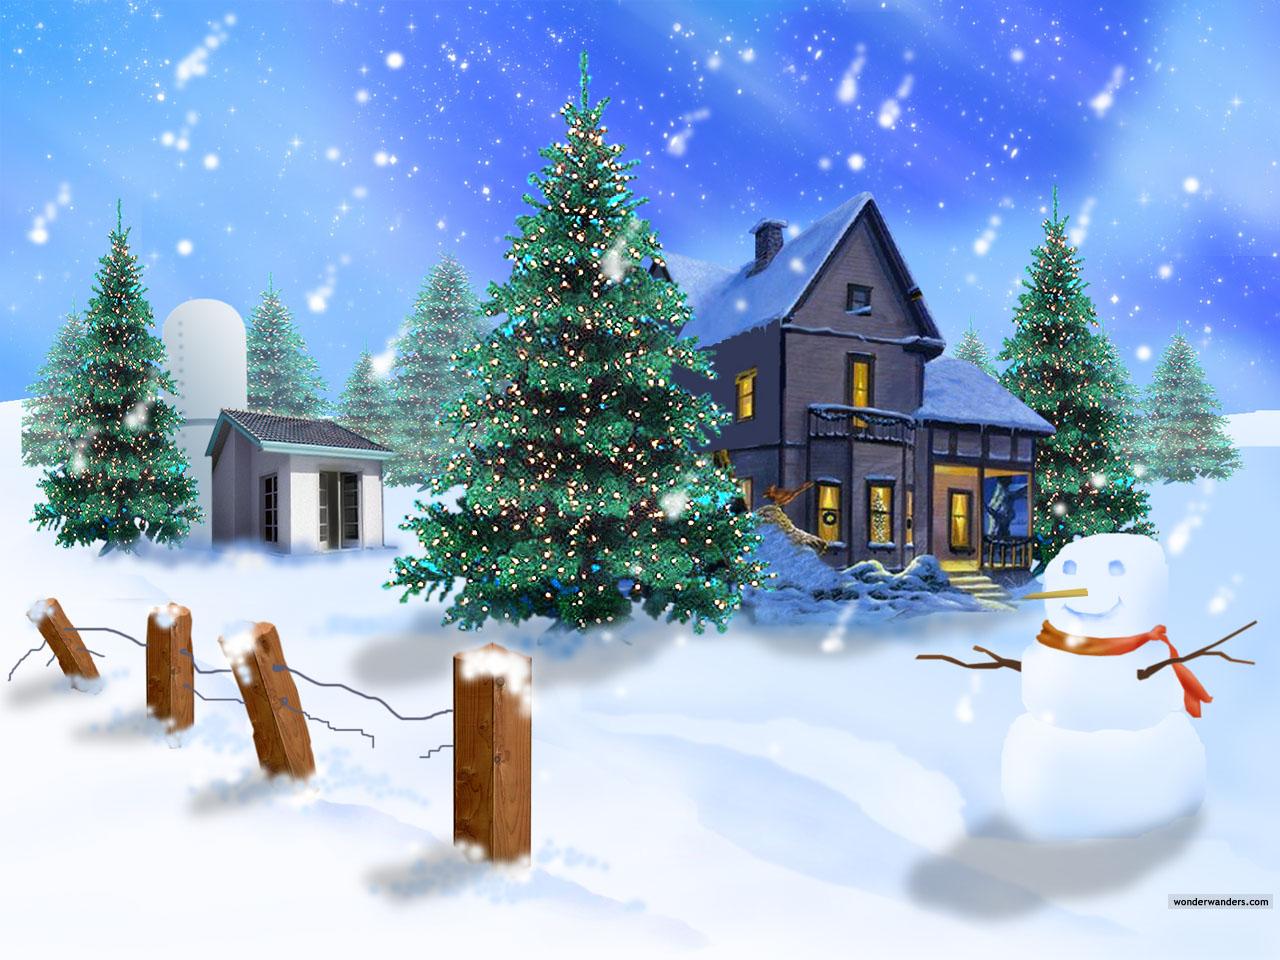 renie blog 54 christmas scene wallpaper 1280x960